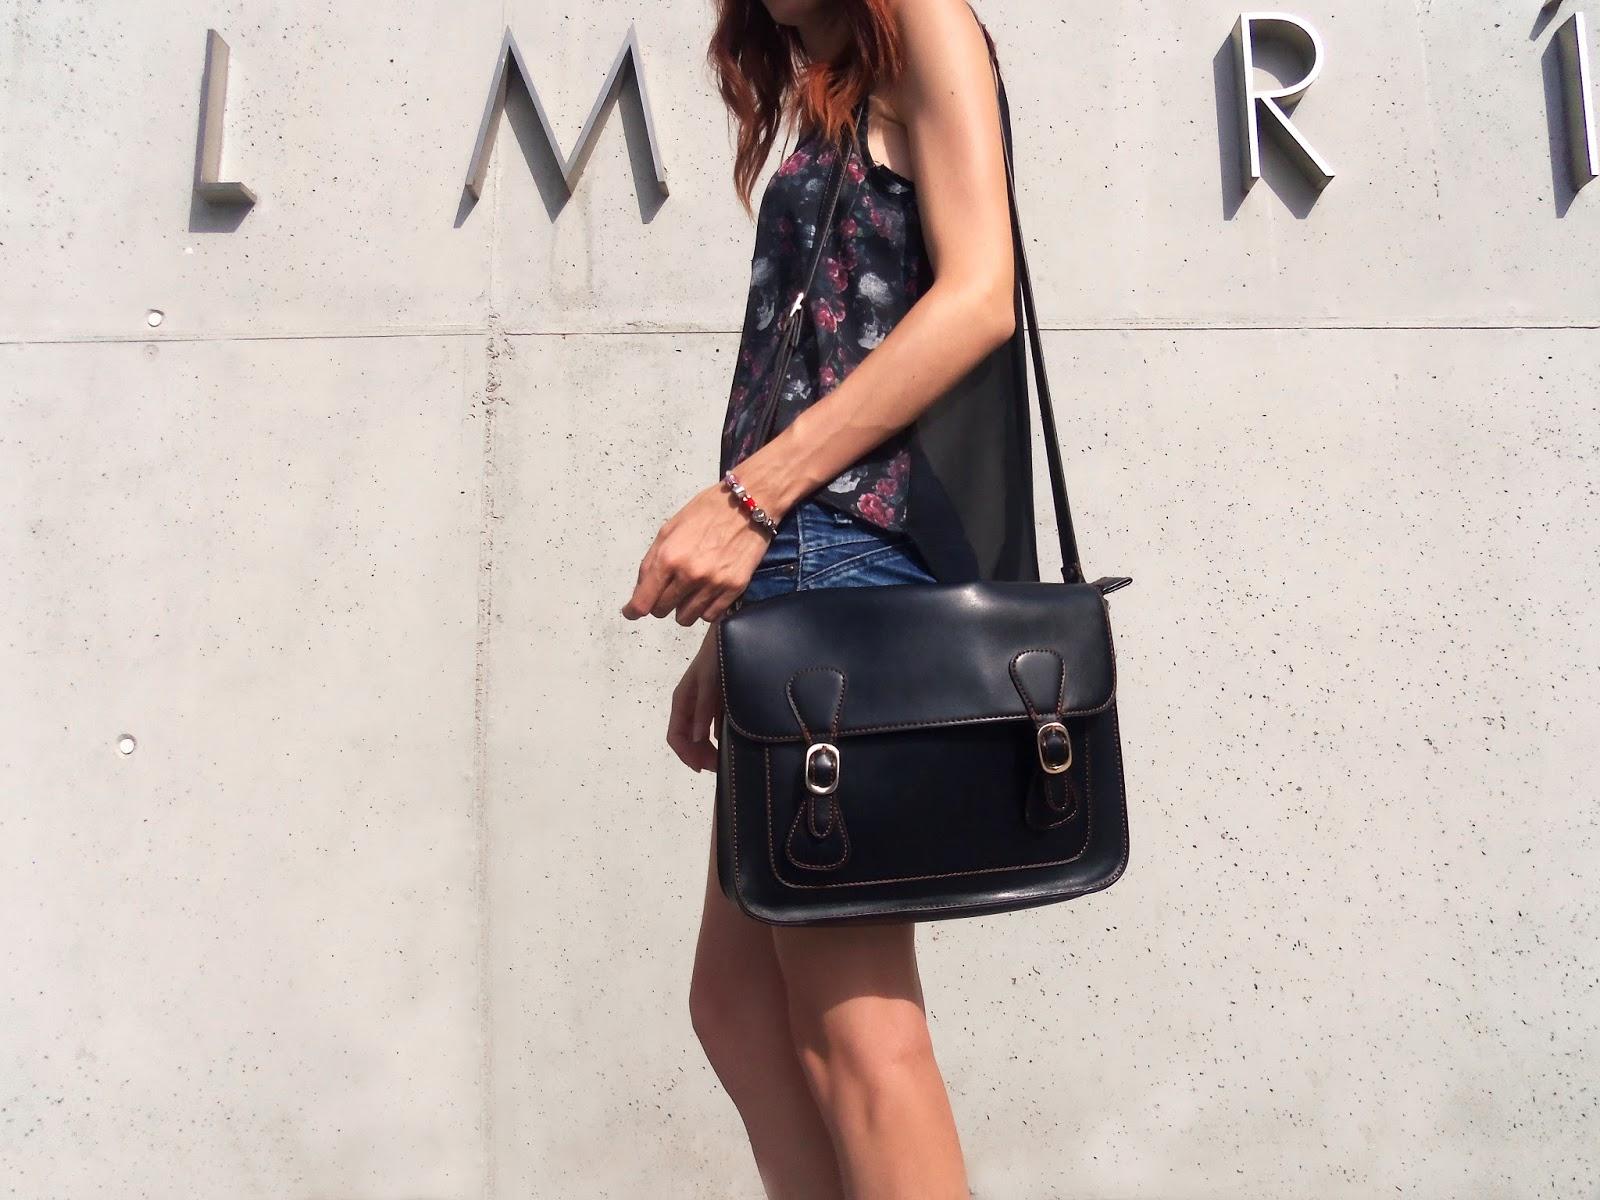 outfit-moda-verano-floral-top-inside-transparente-soufeel